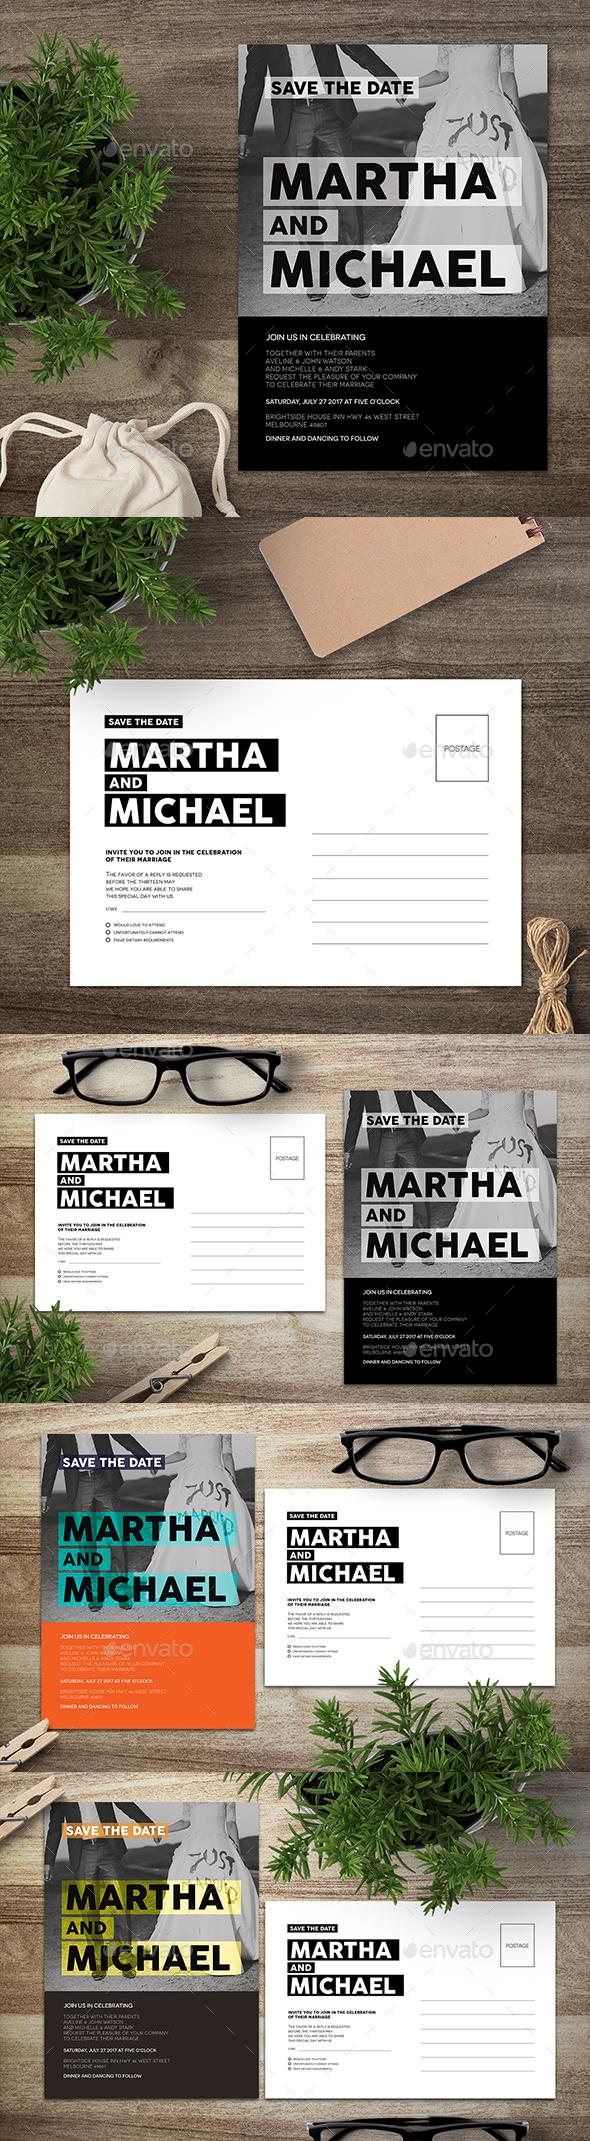 Wedding Postcard Invitation - Invitations Cards & Invites